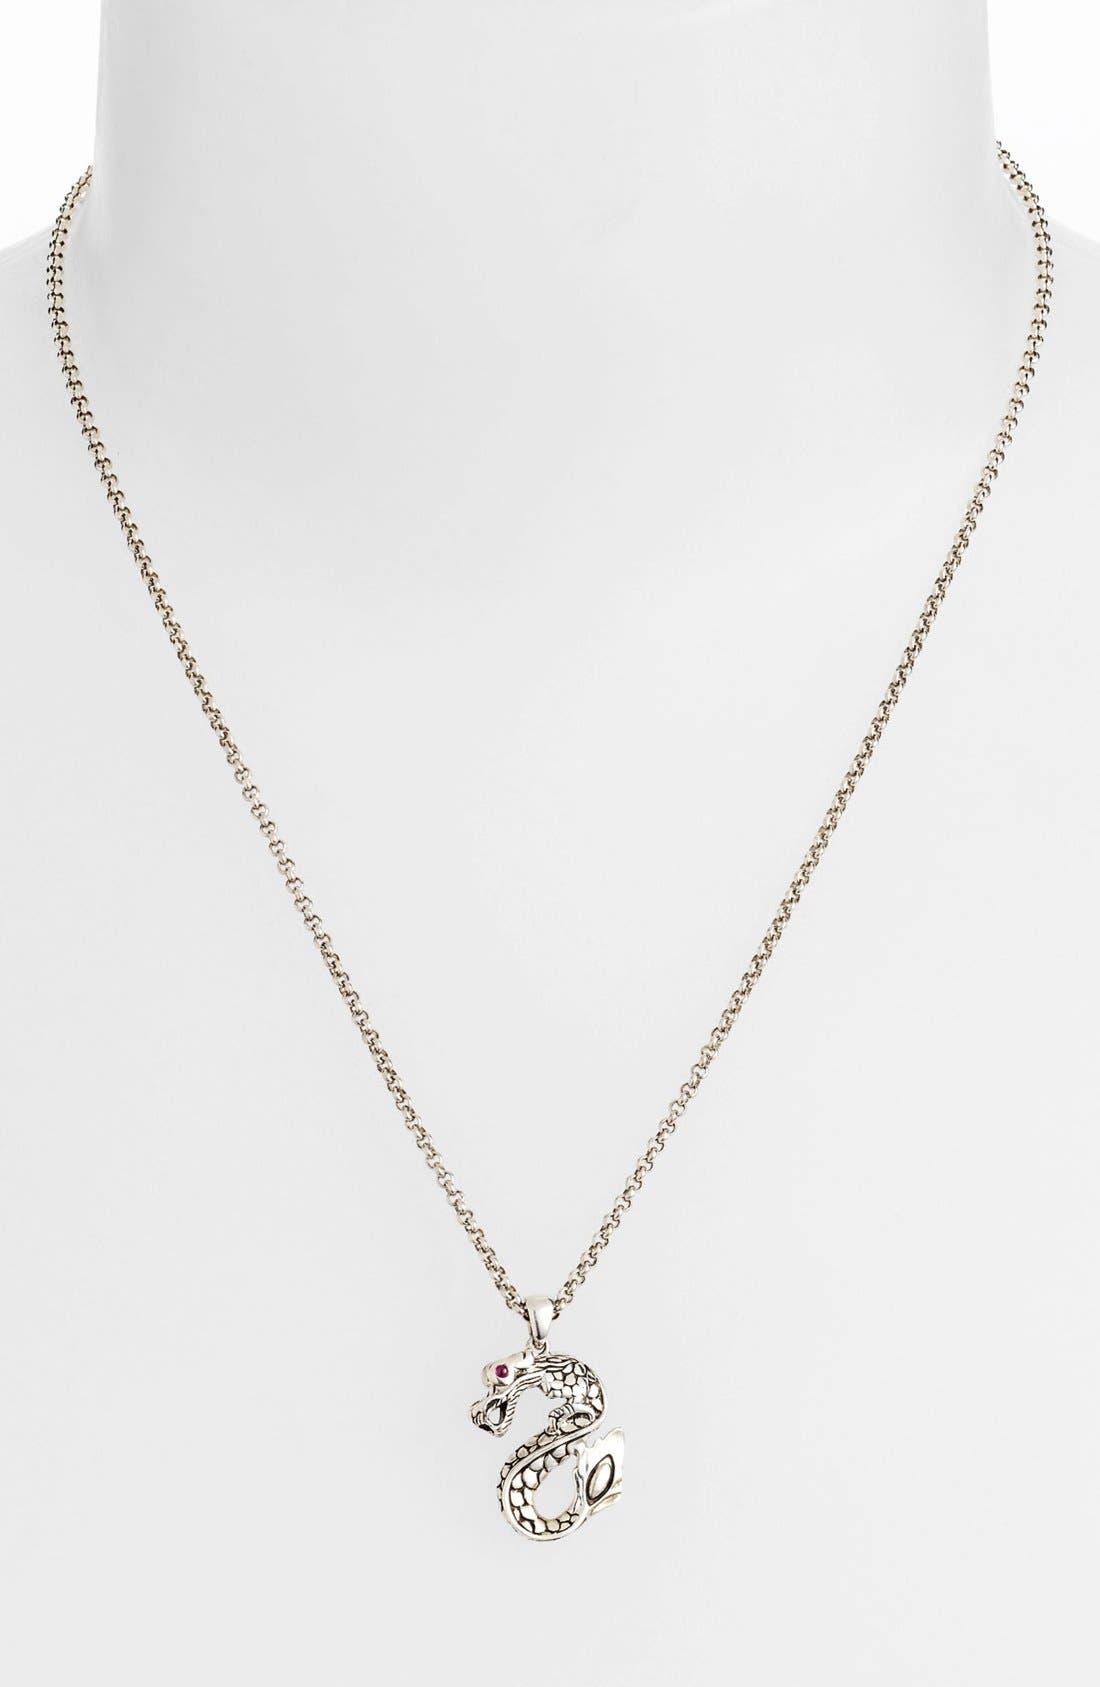 Main Image - John Hardy 'Naga Batu' Dragon Pendant Necklace